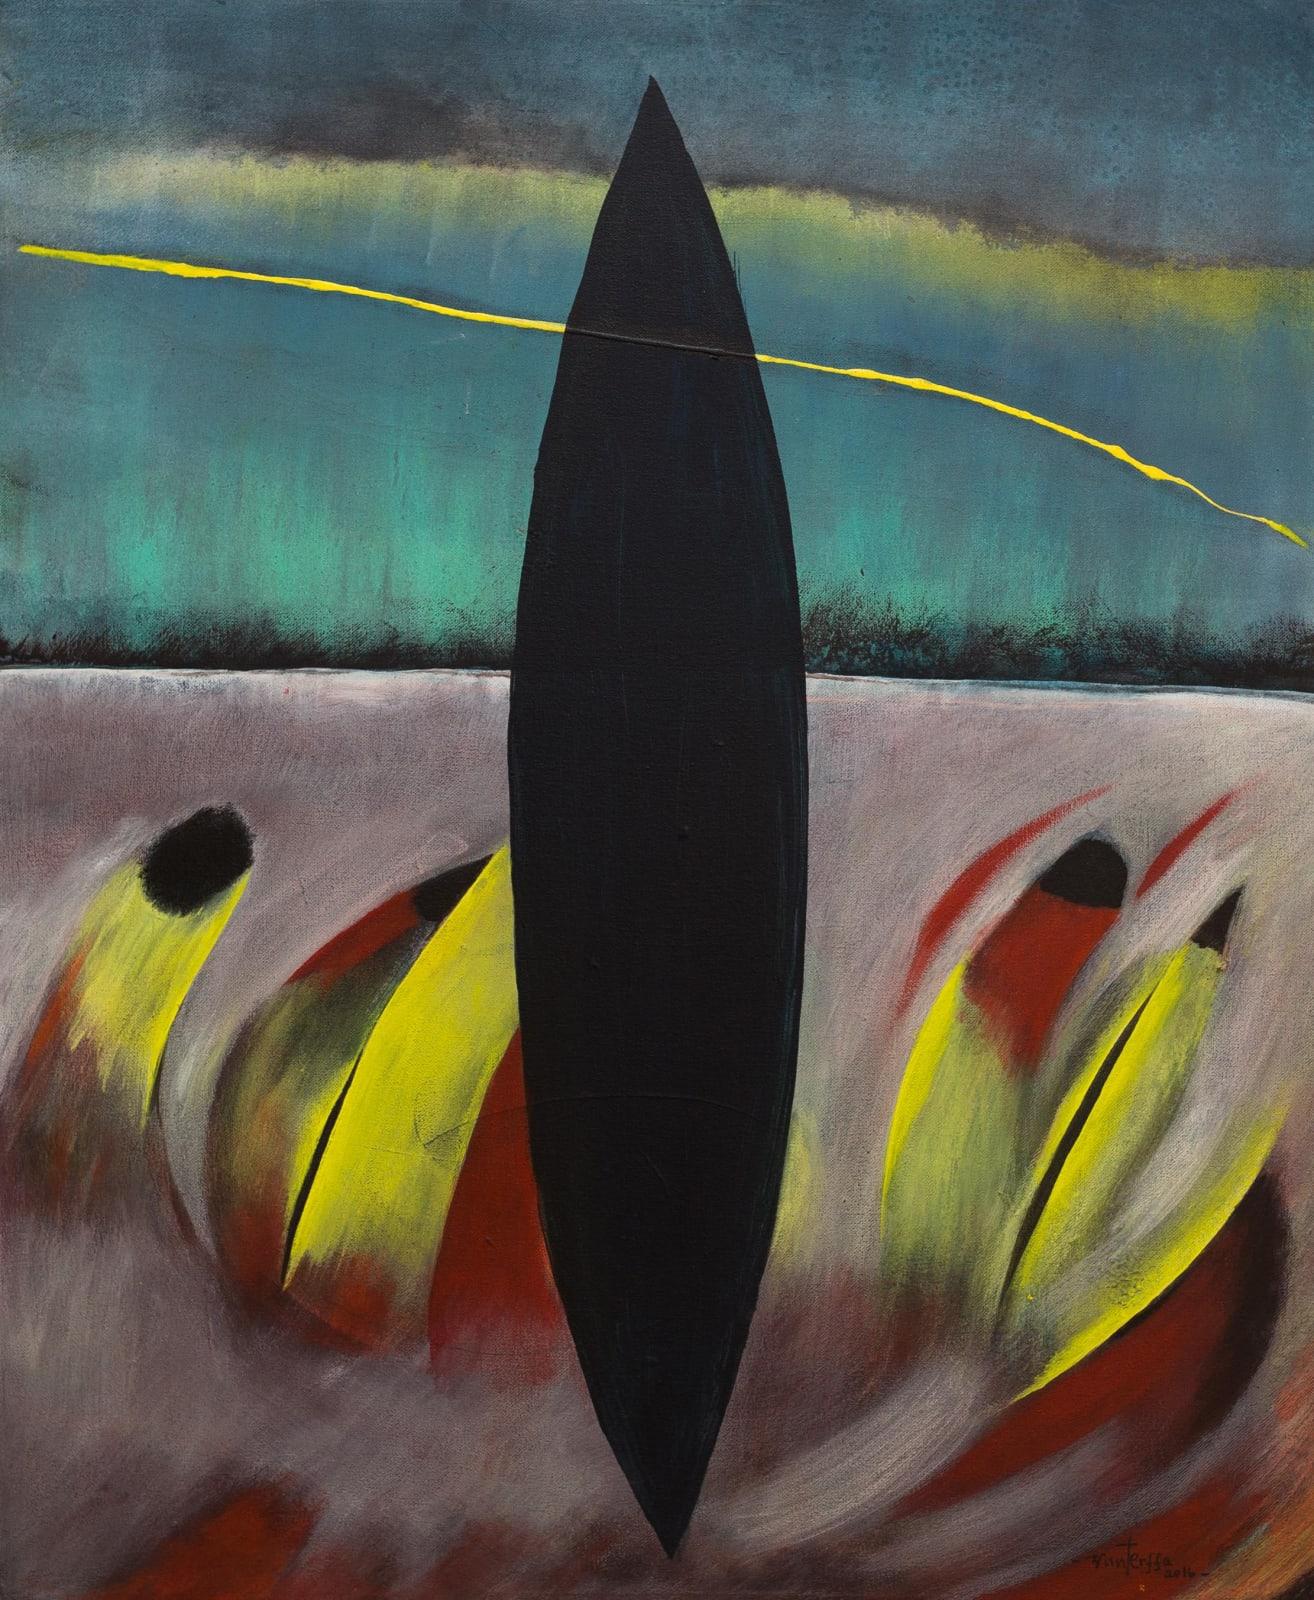 Tibebe Terffa , Untitled V, 2016